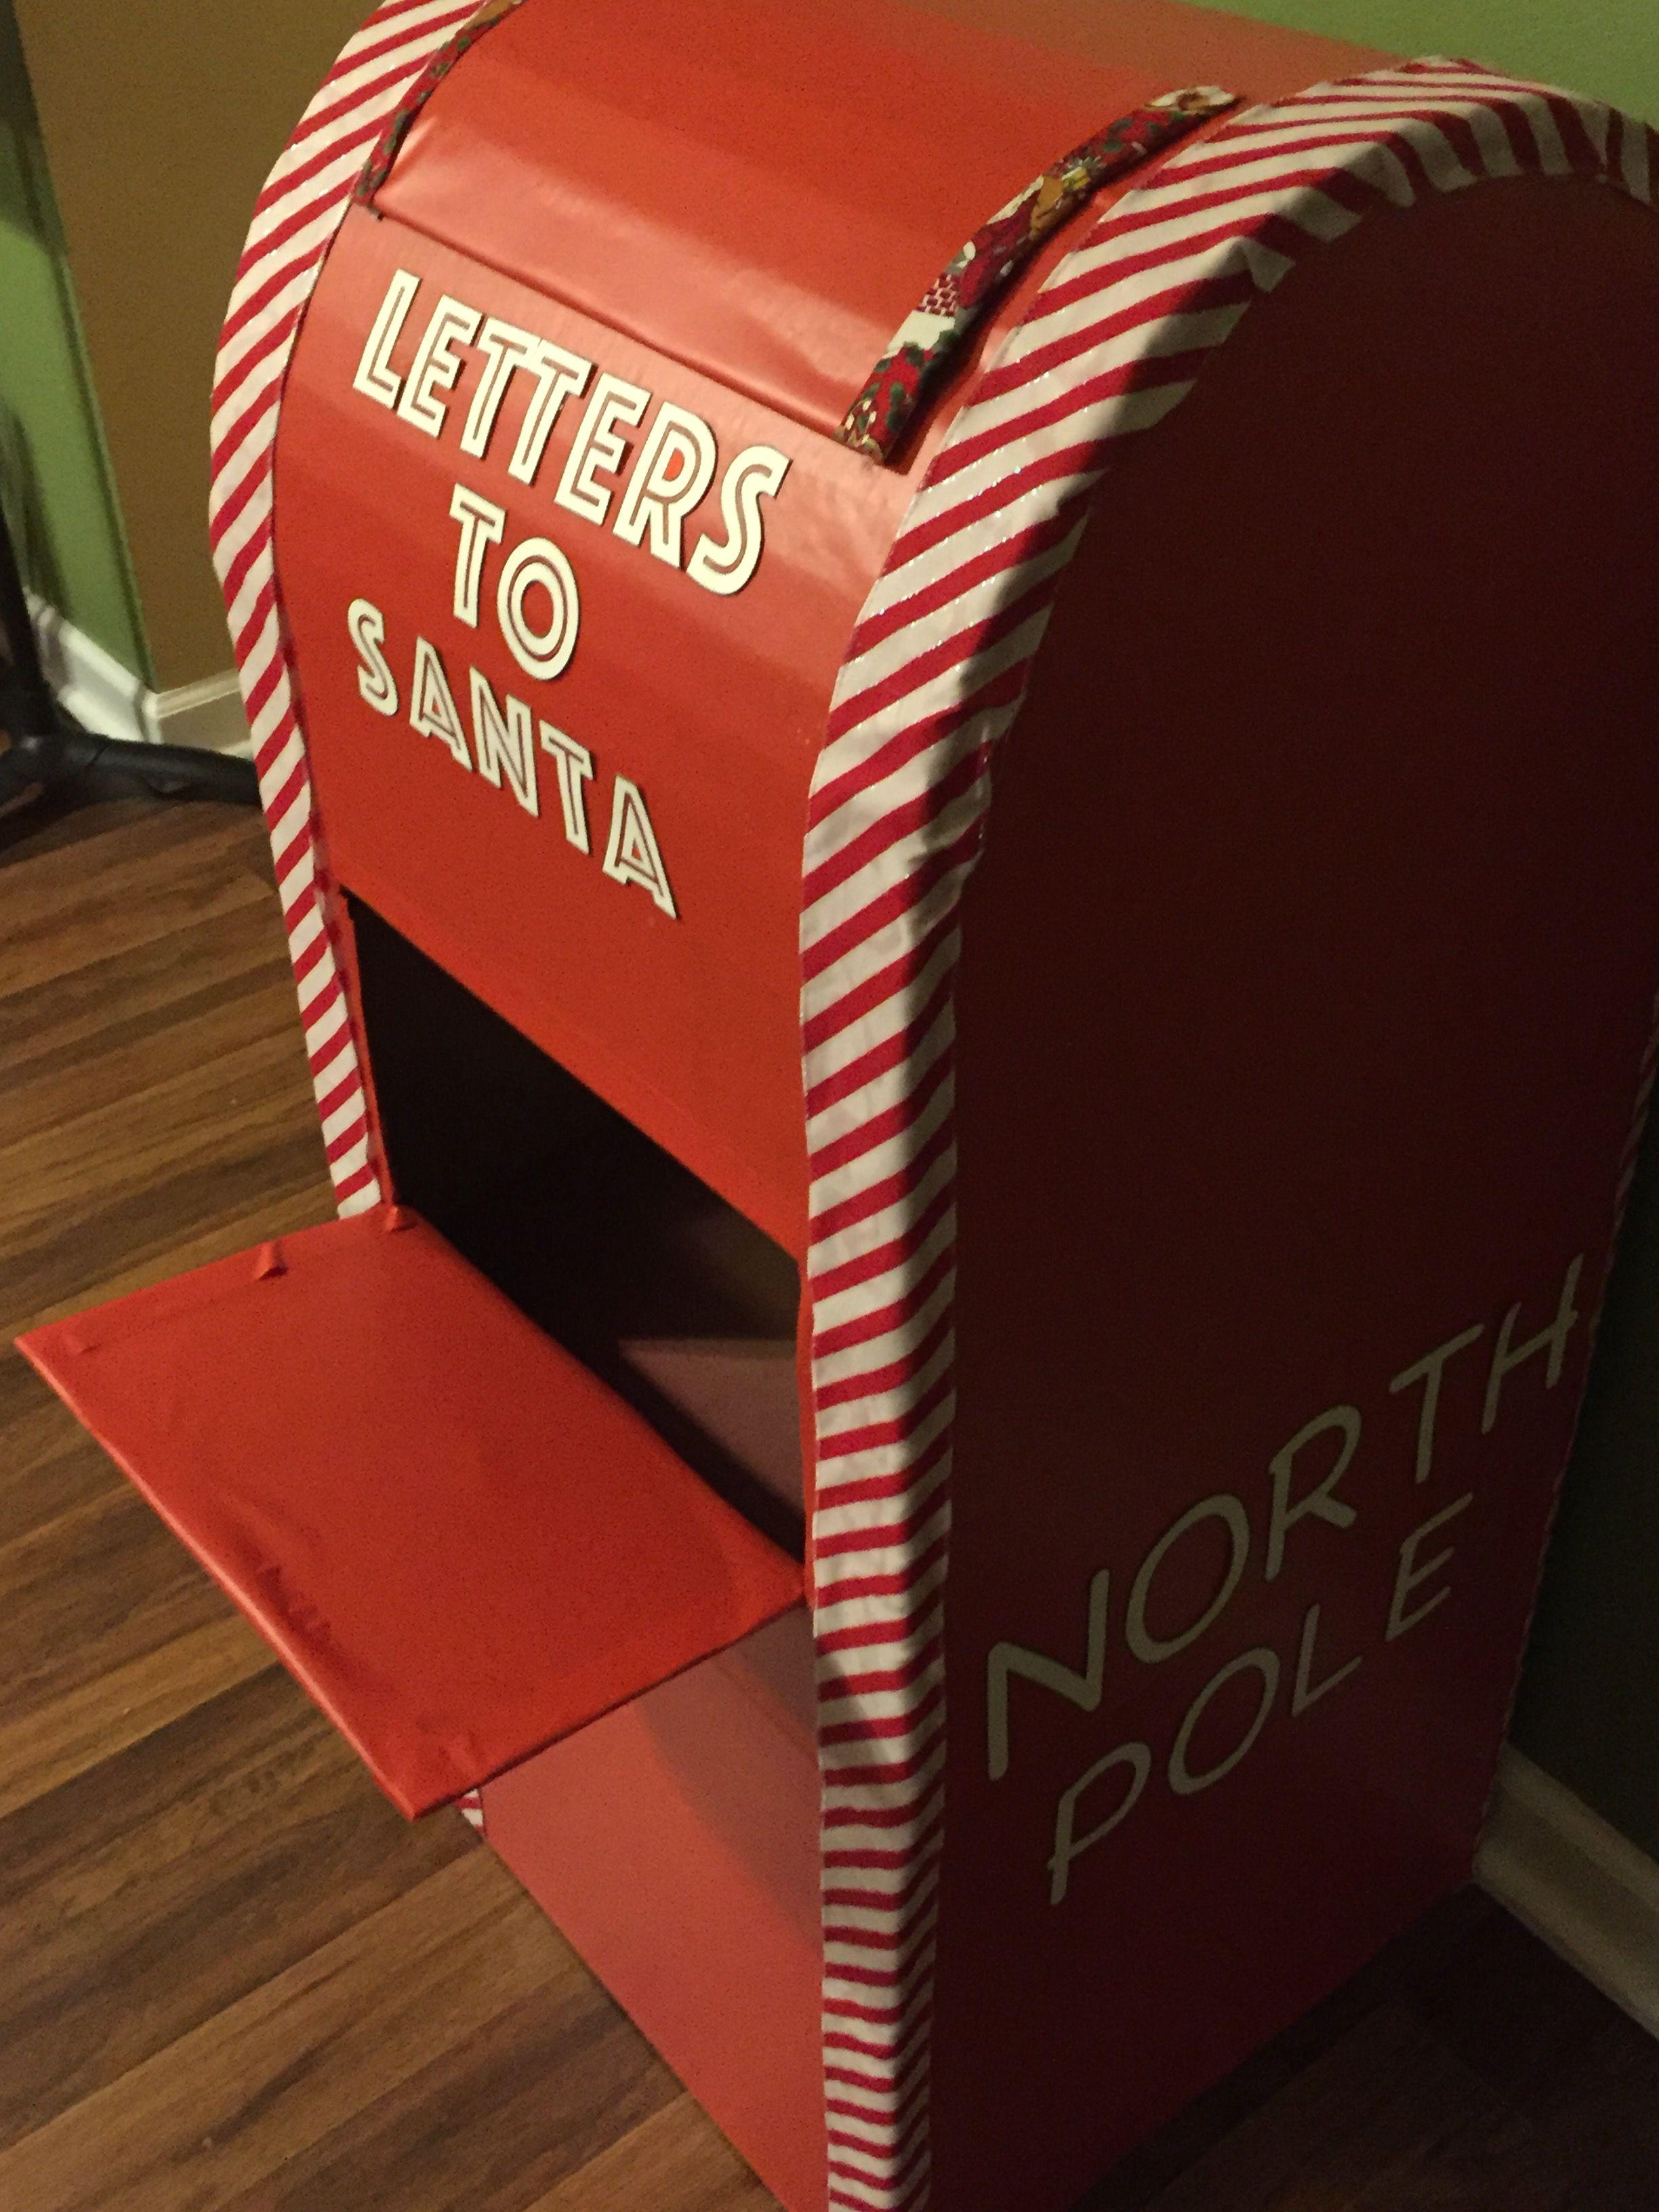 Cardboard Letters To Santa Mailbox Diy Santa Christmas Lettering Christmas Decor Diy